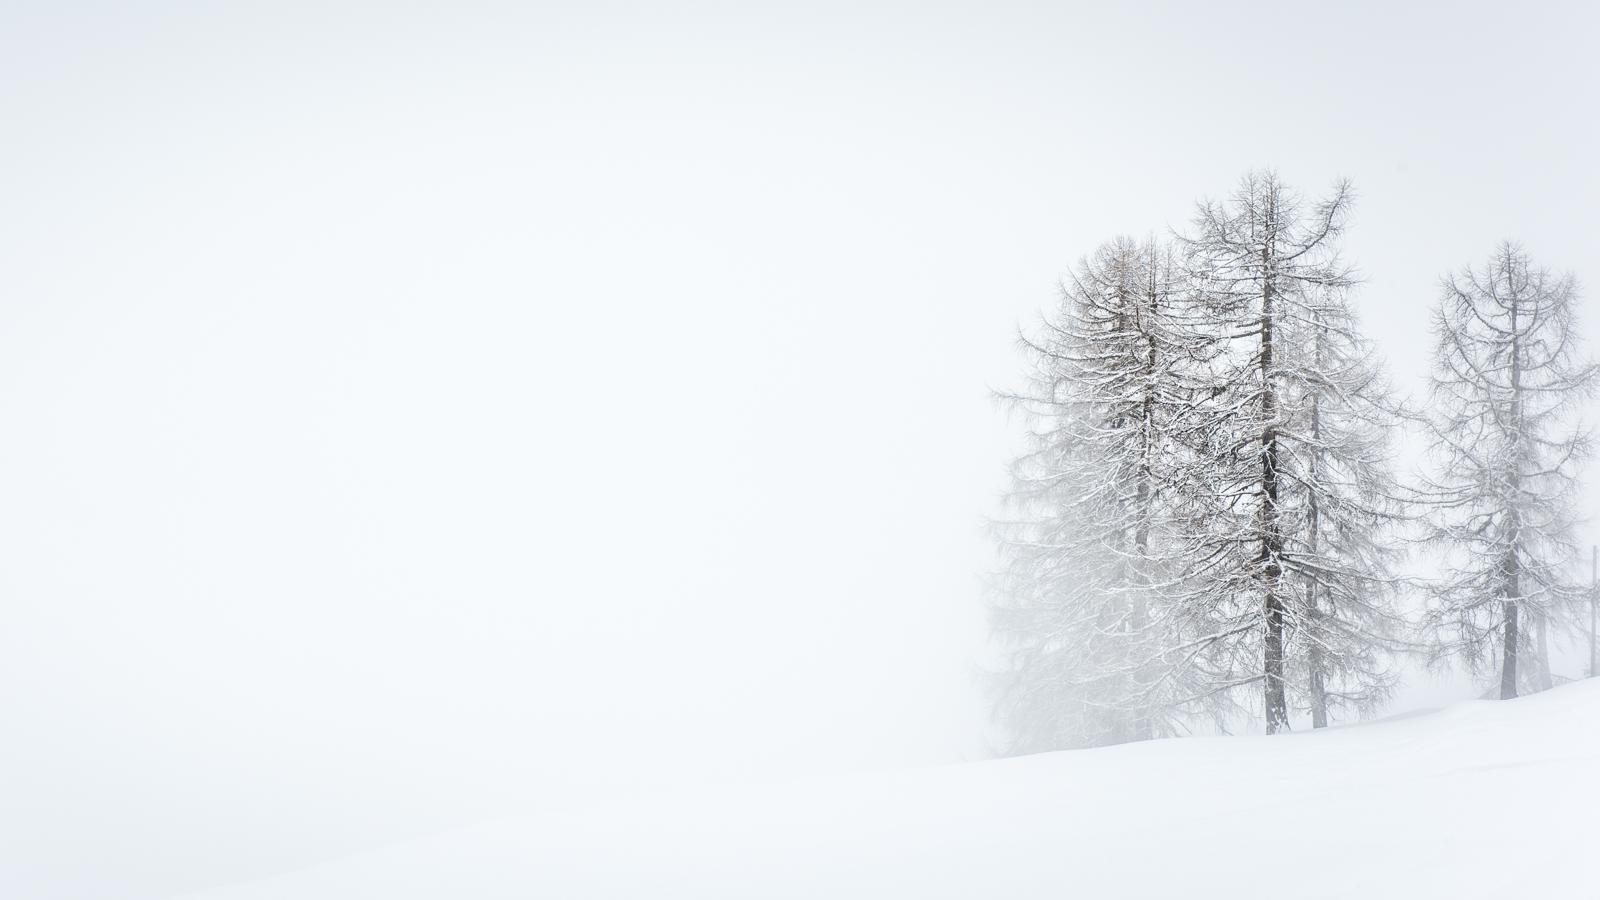 Zsofia_Daniel_Trees-12.jpg